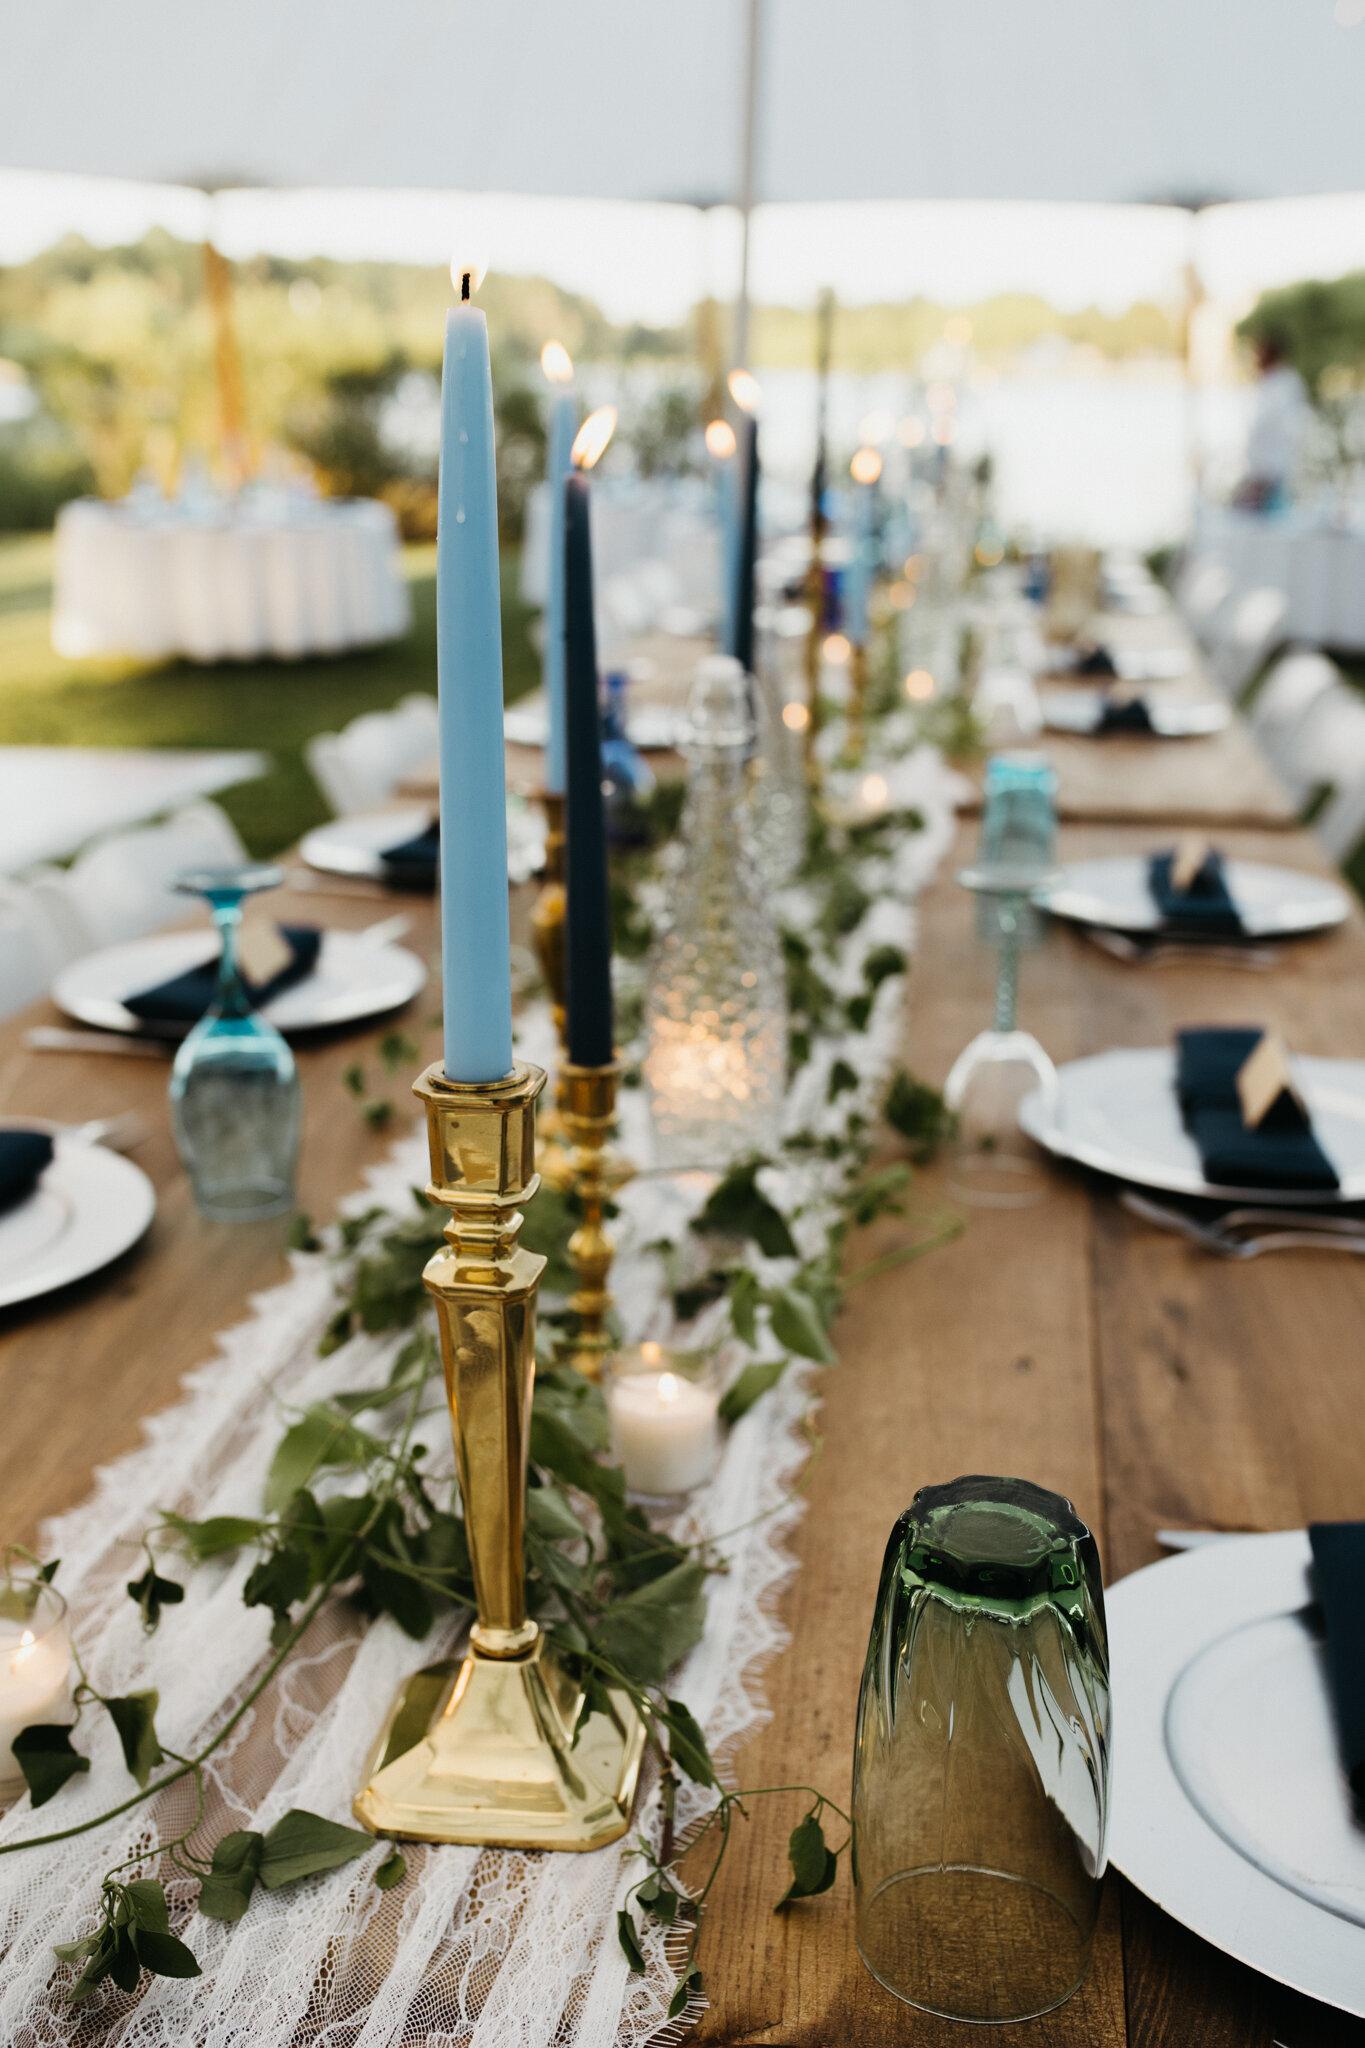 angela_jason_norfolk_wedding-114.jpg